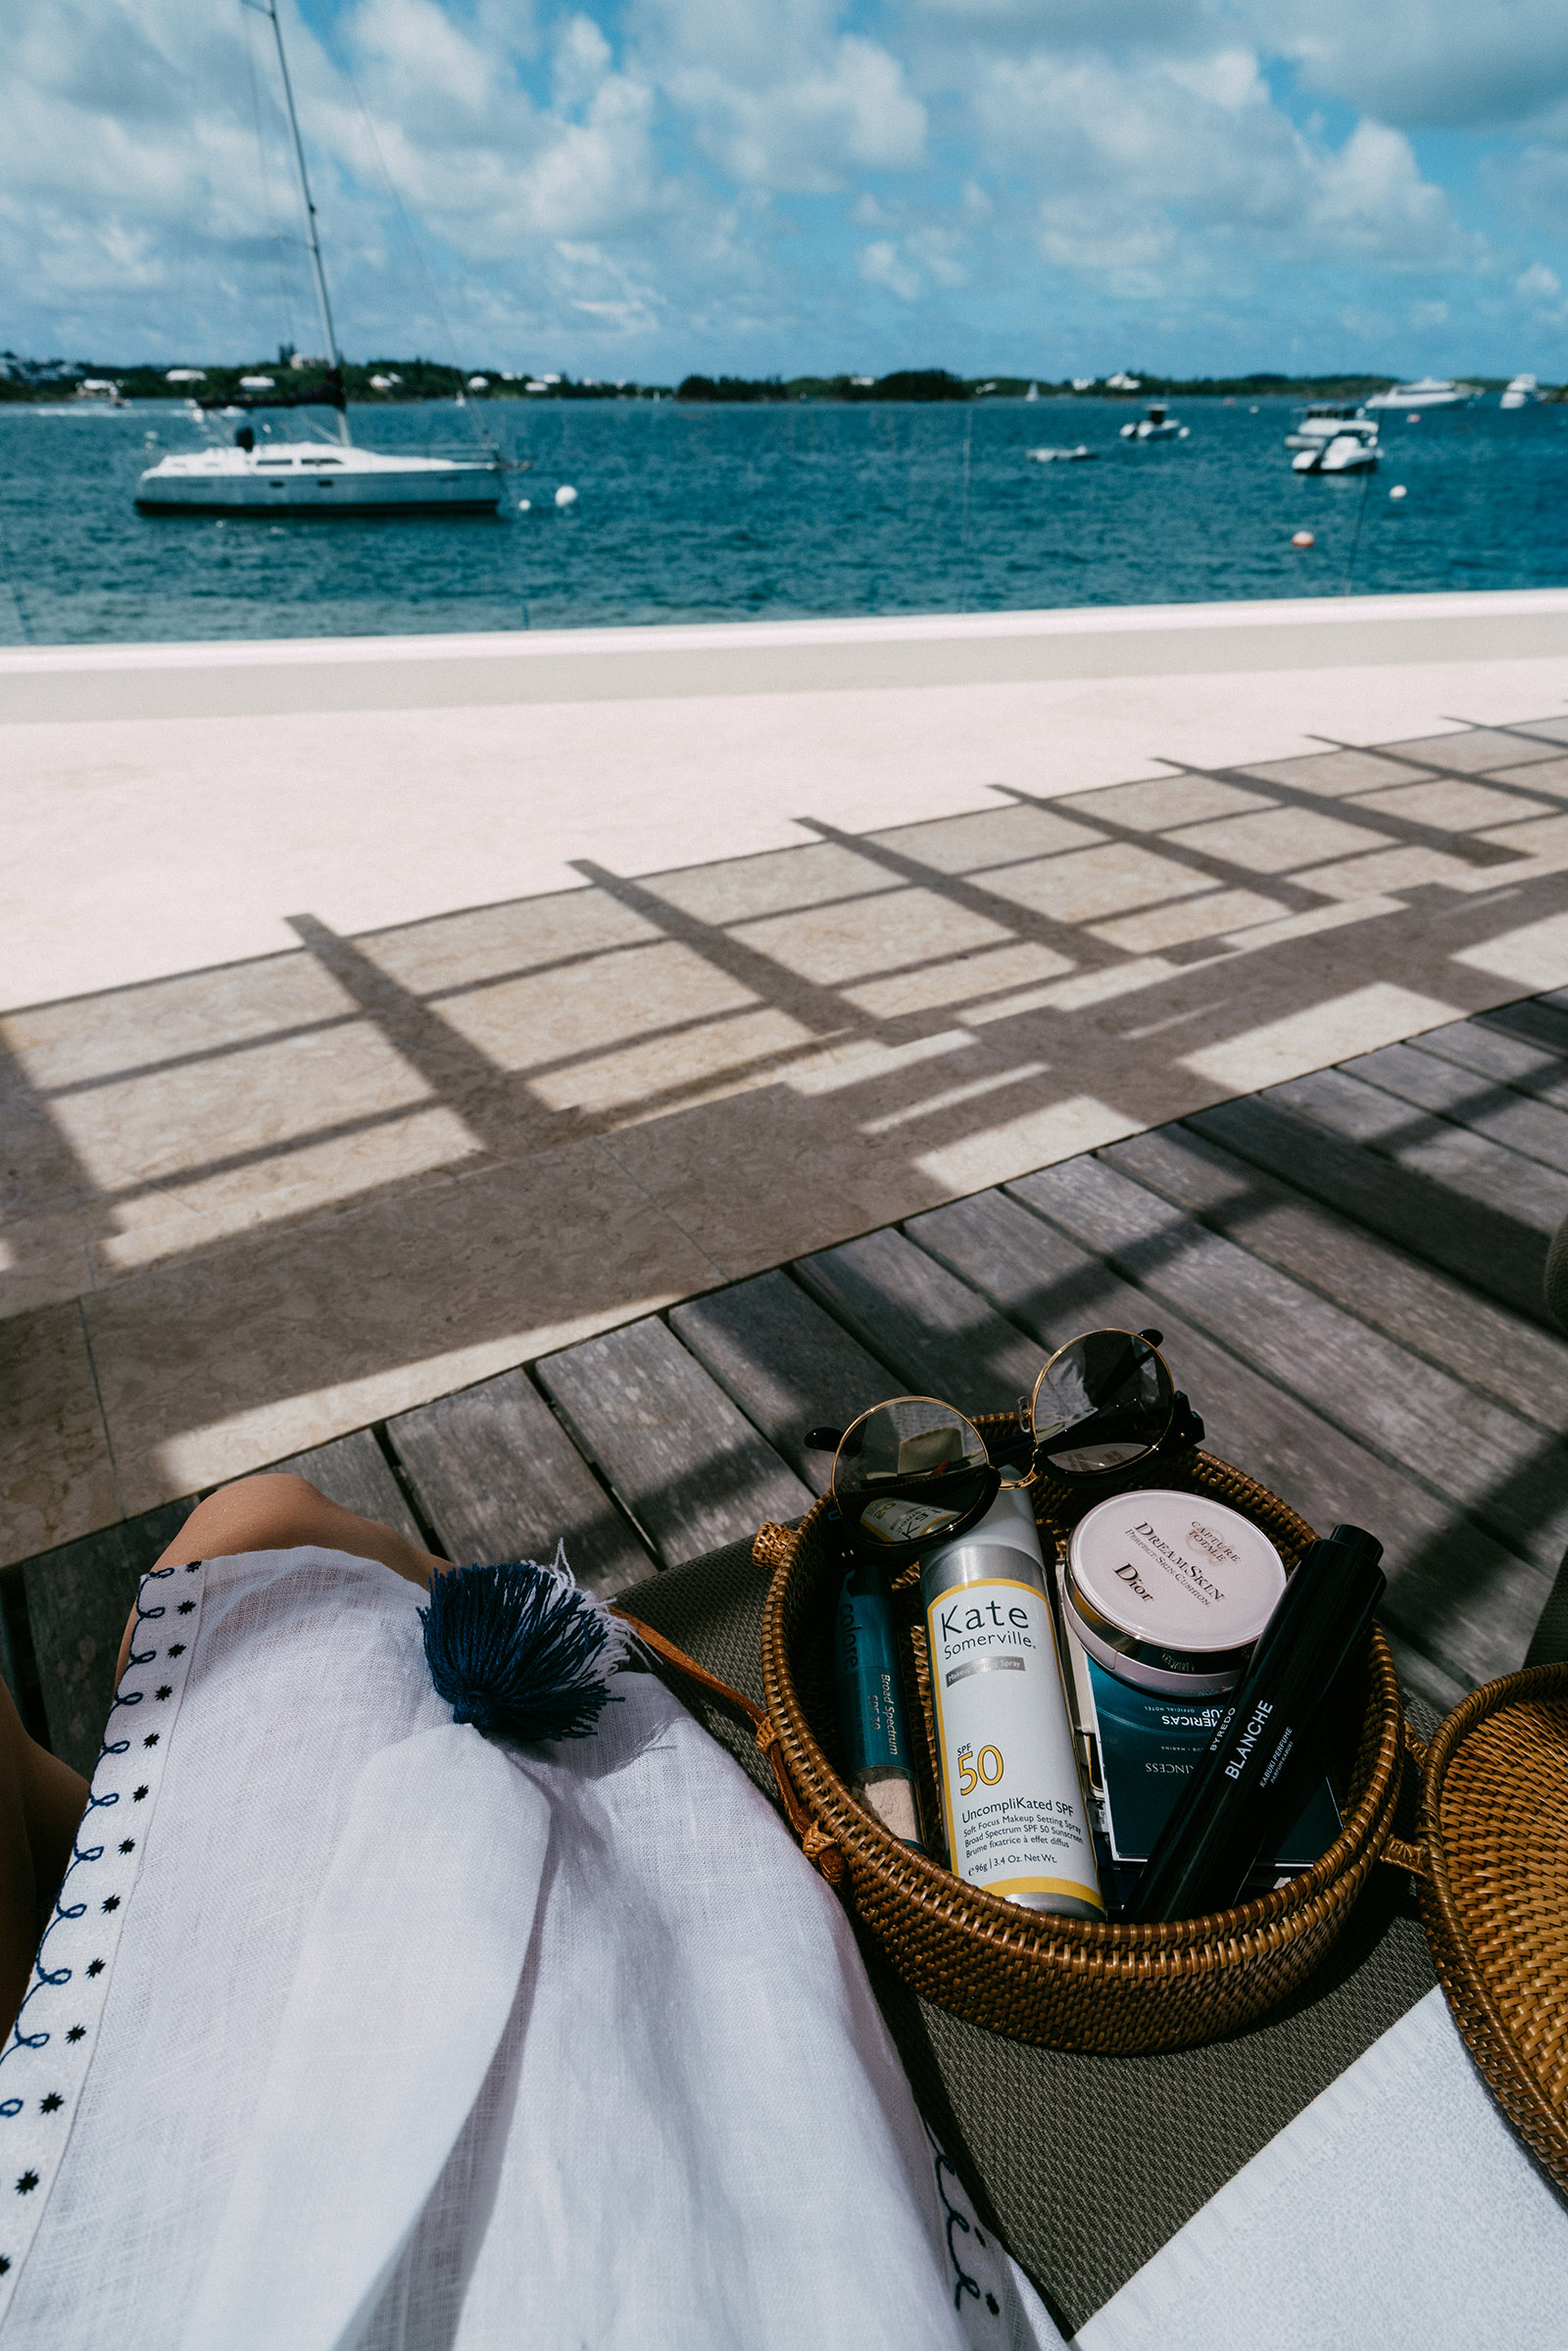 Colorescience Sunscreen ,  Kate Somerville Sunscreen ,  Dior Cushion Compact ,  Byredo Perfume ,  Gentle Monster Sunglasses